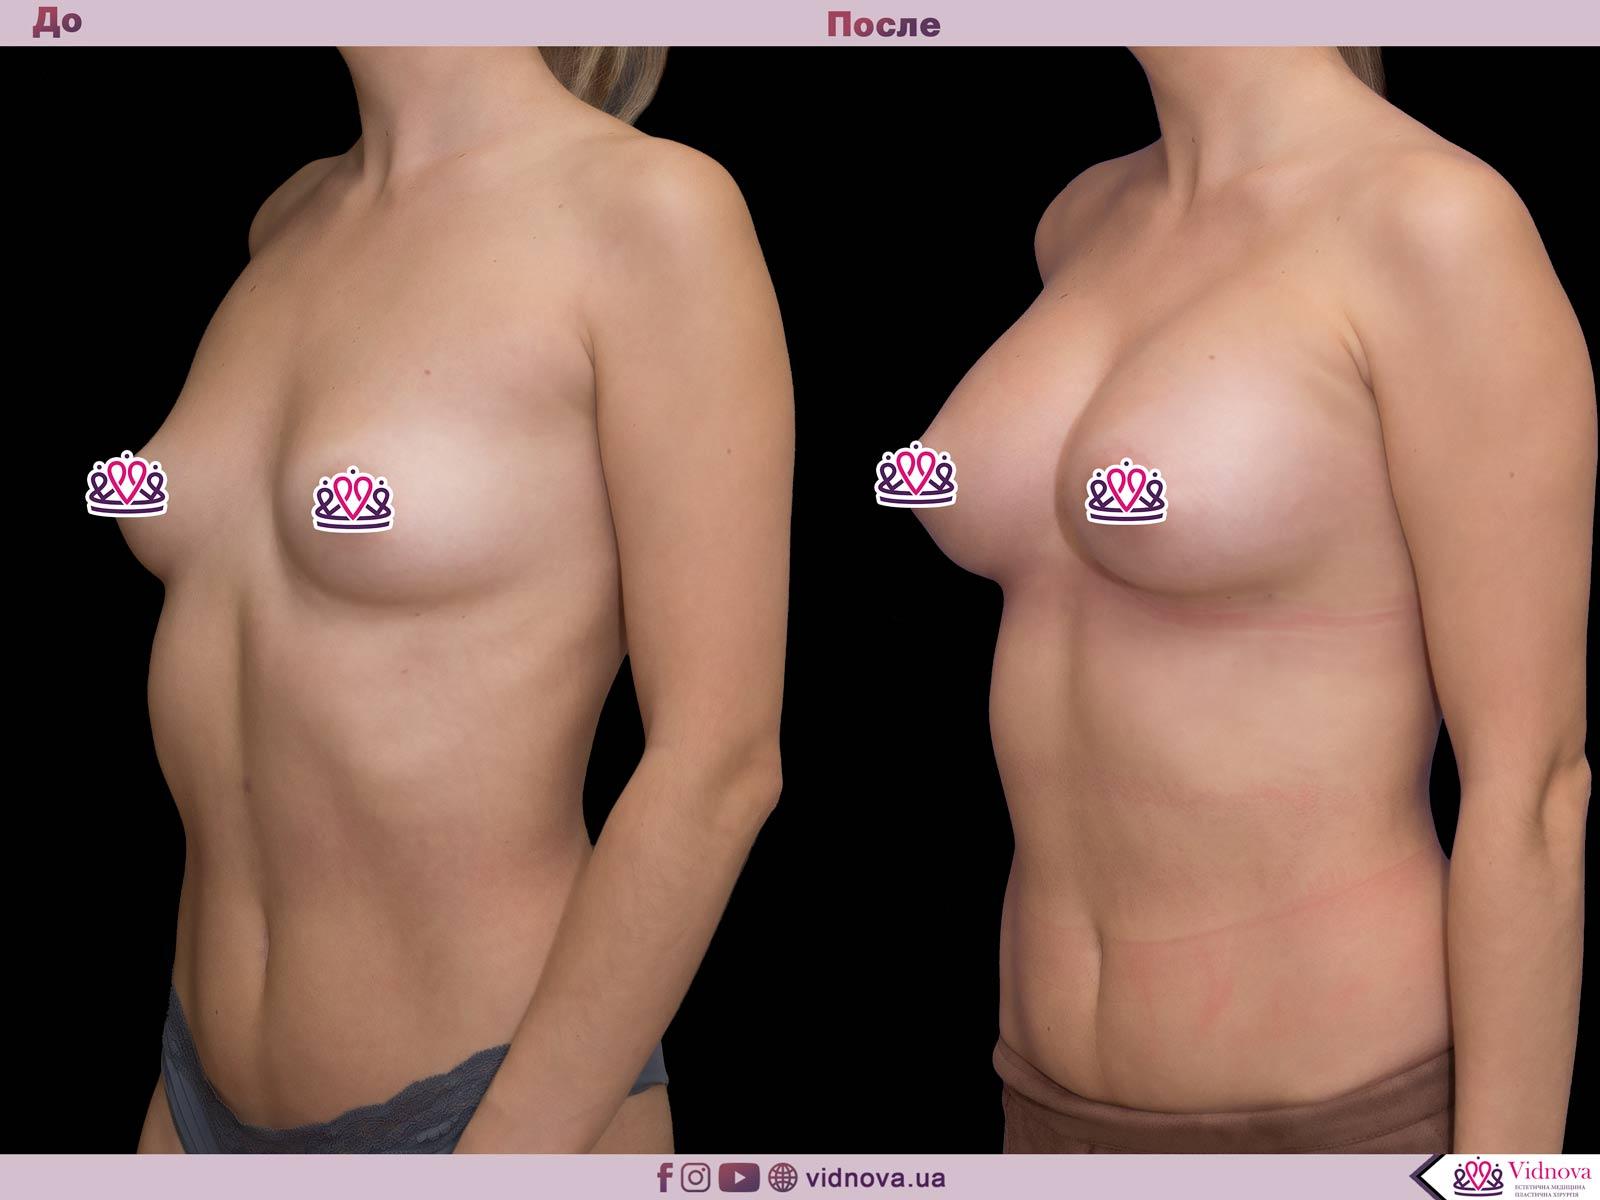 Увеличение груди: Фото ДО и ПОСЛЕ - Пример №40-2 - Клиника Vidnova